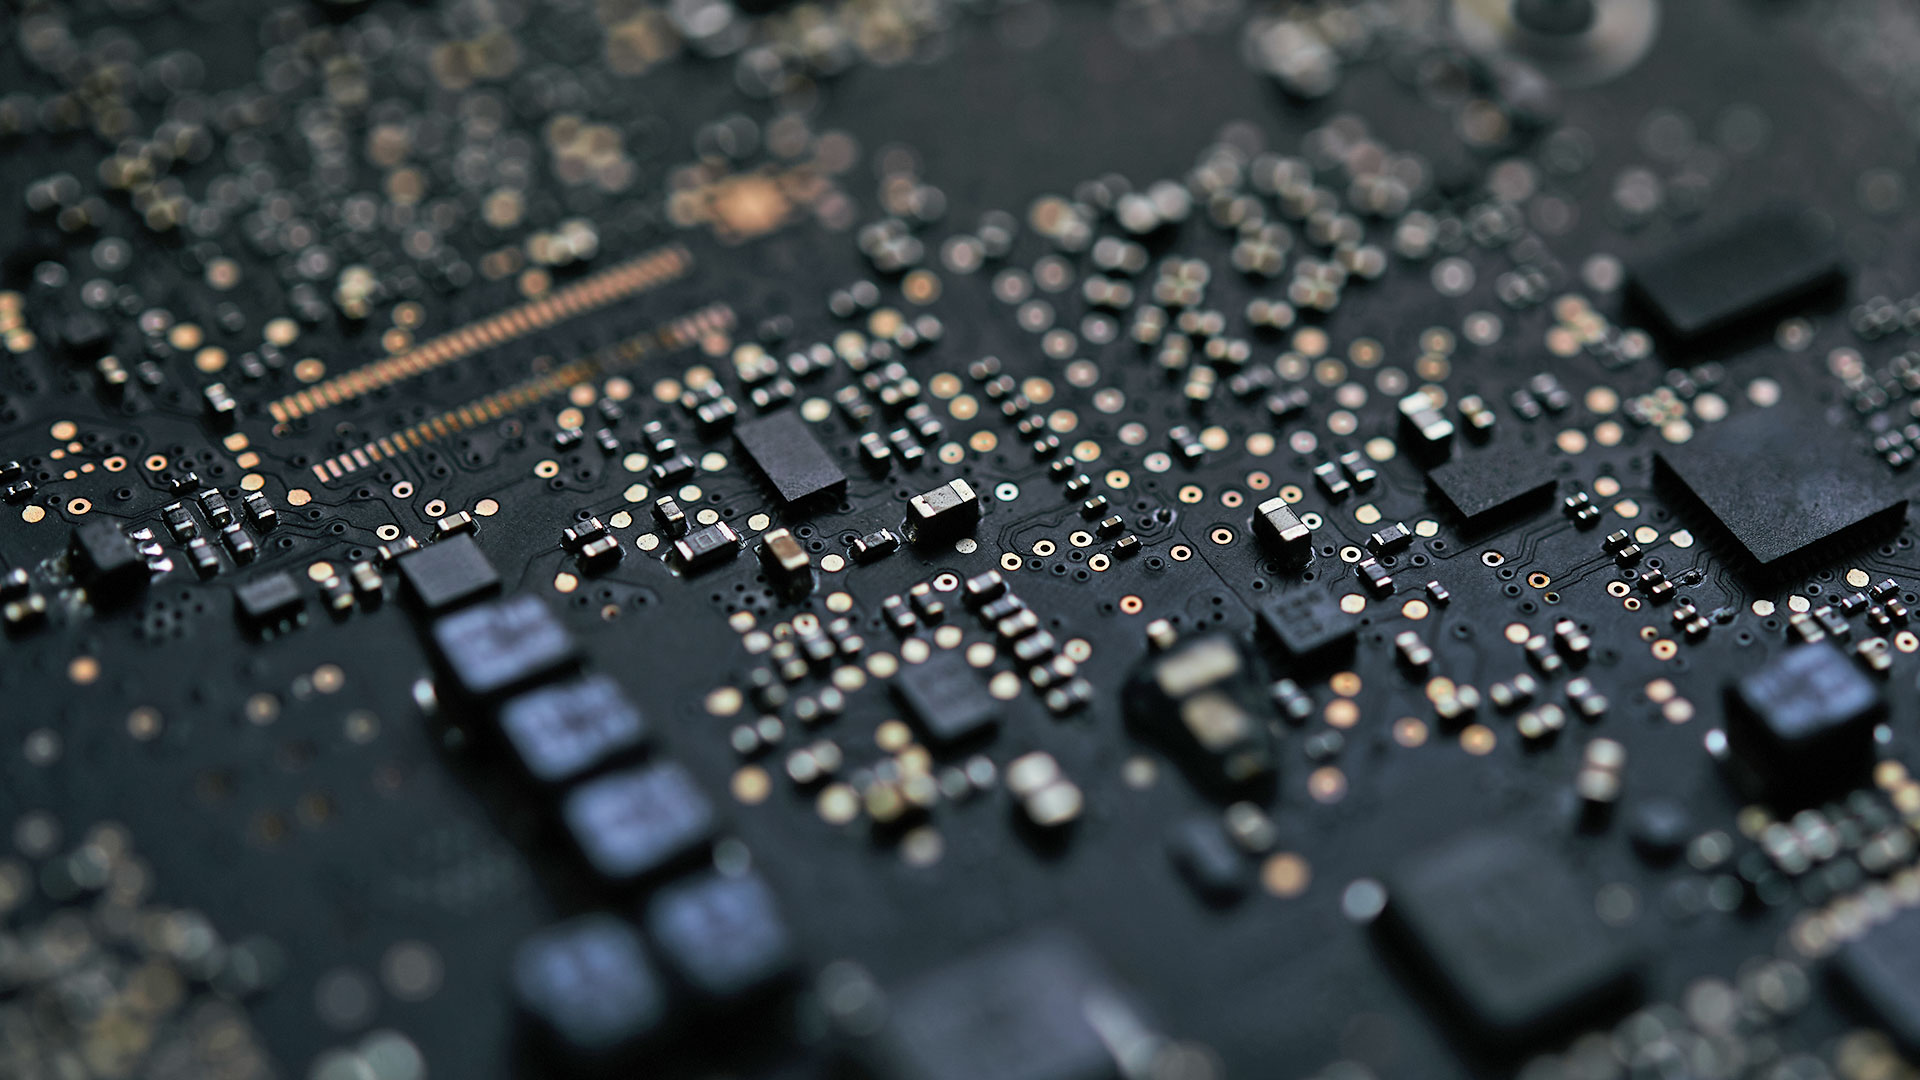 Embedded technology – Tuxera